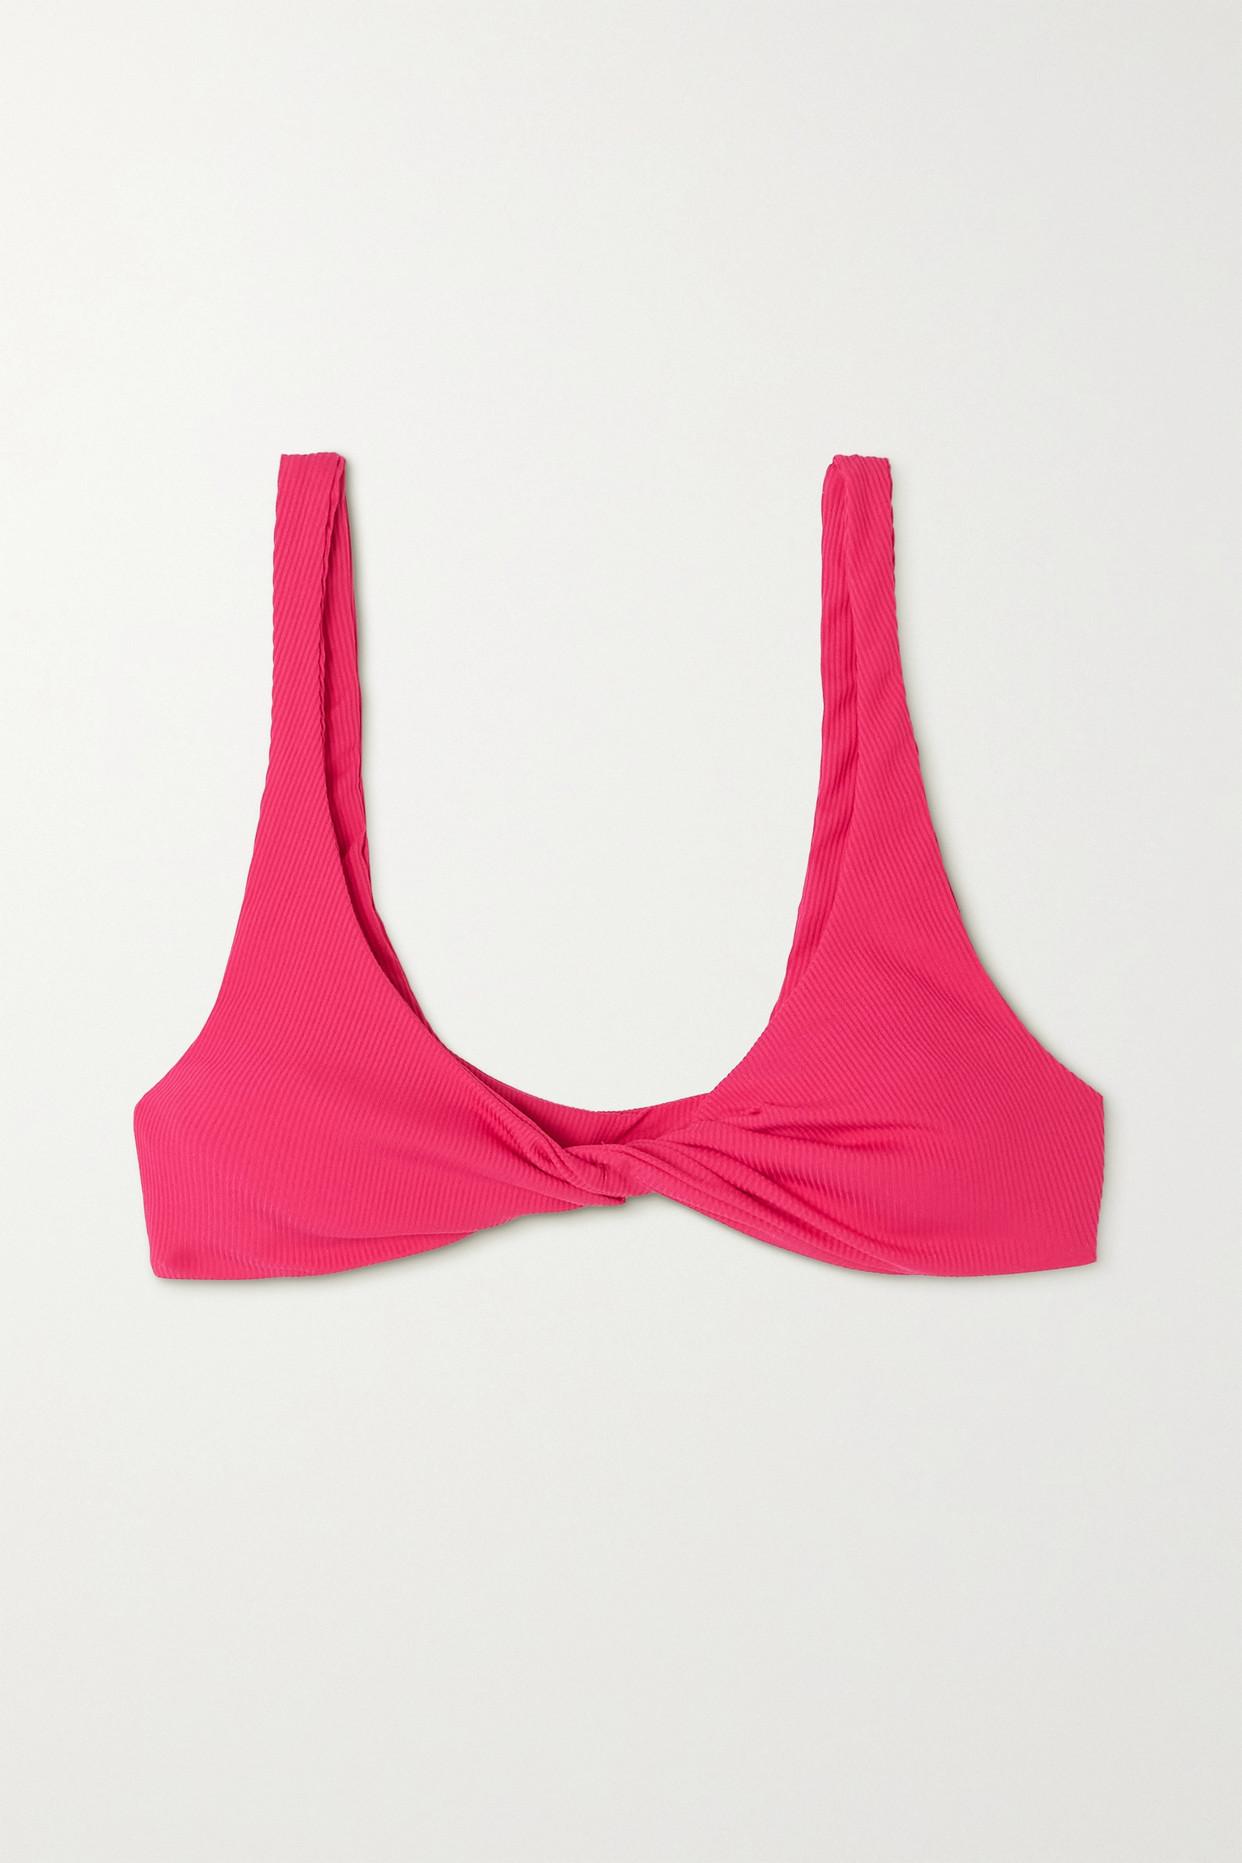 THE ATTICO - Twisted Ribbed Triangle Bikini Top - Pink - x small